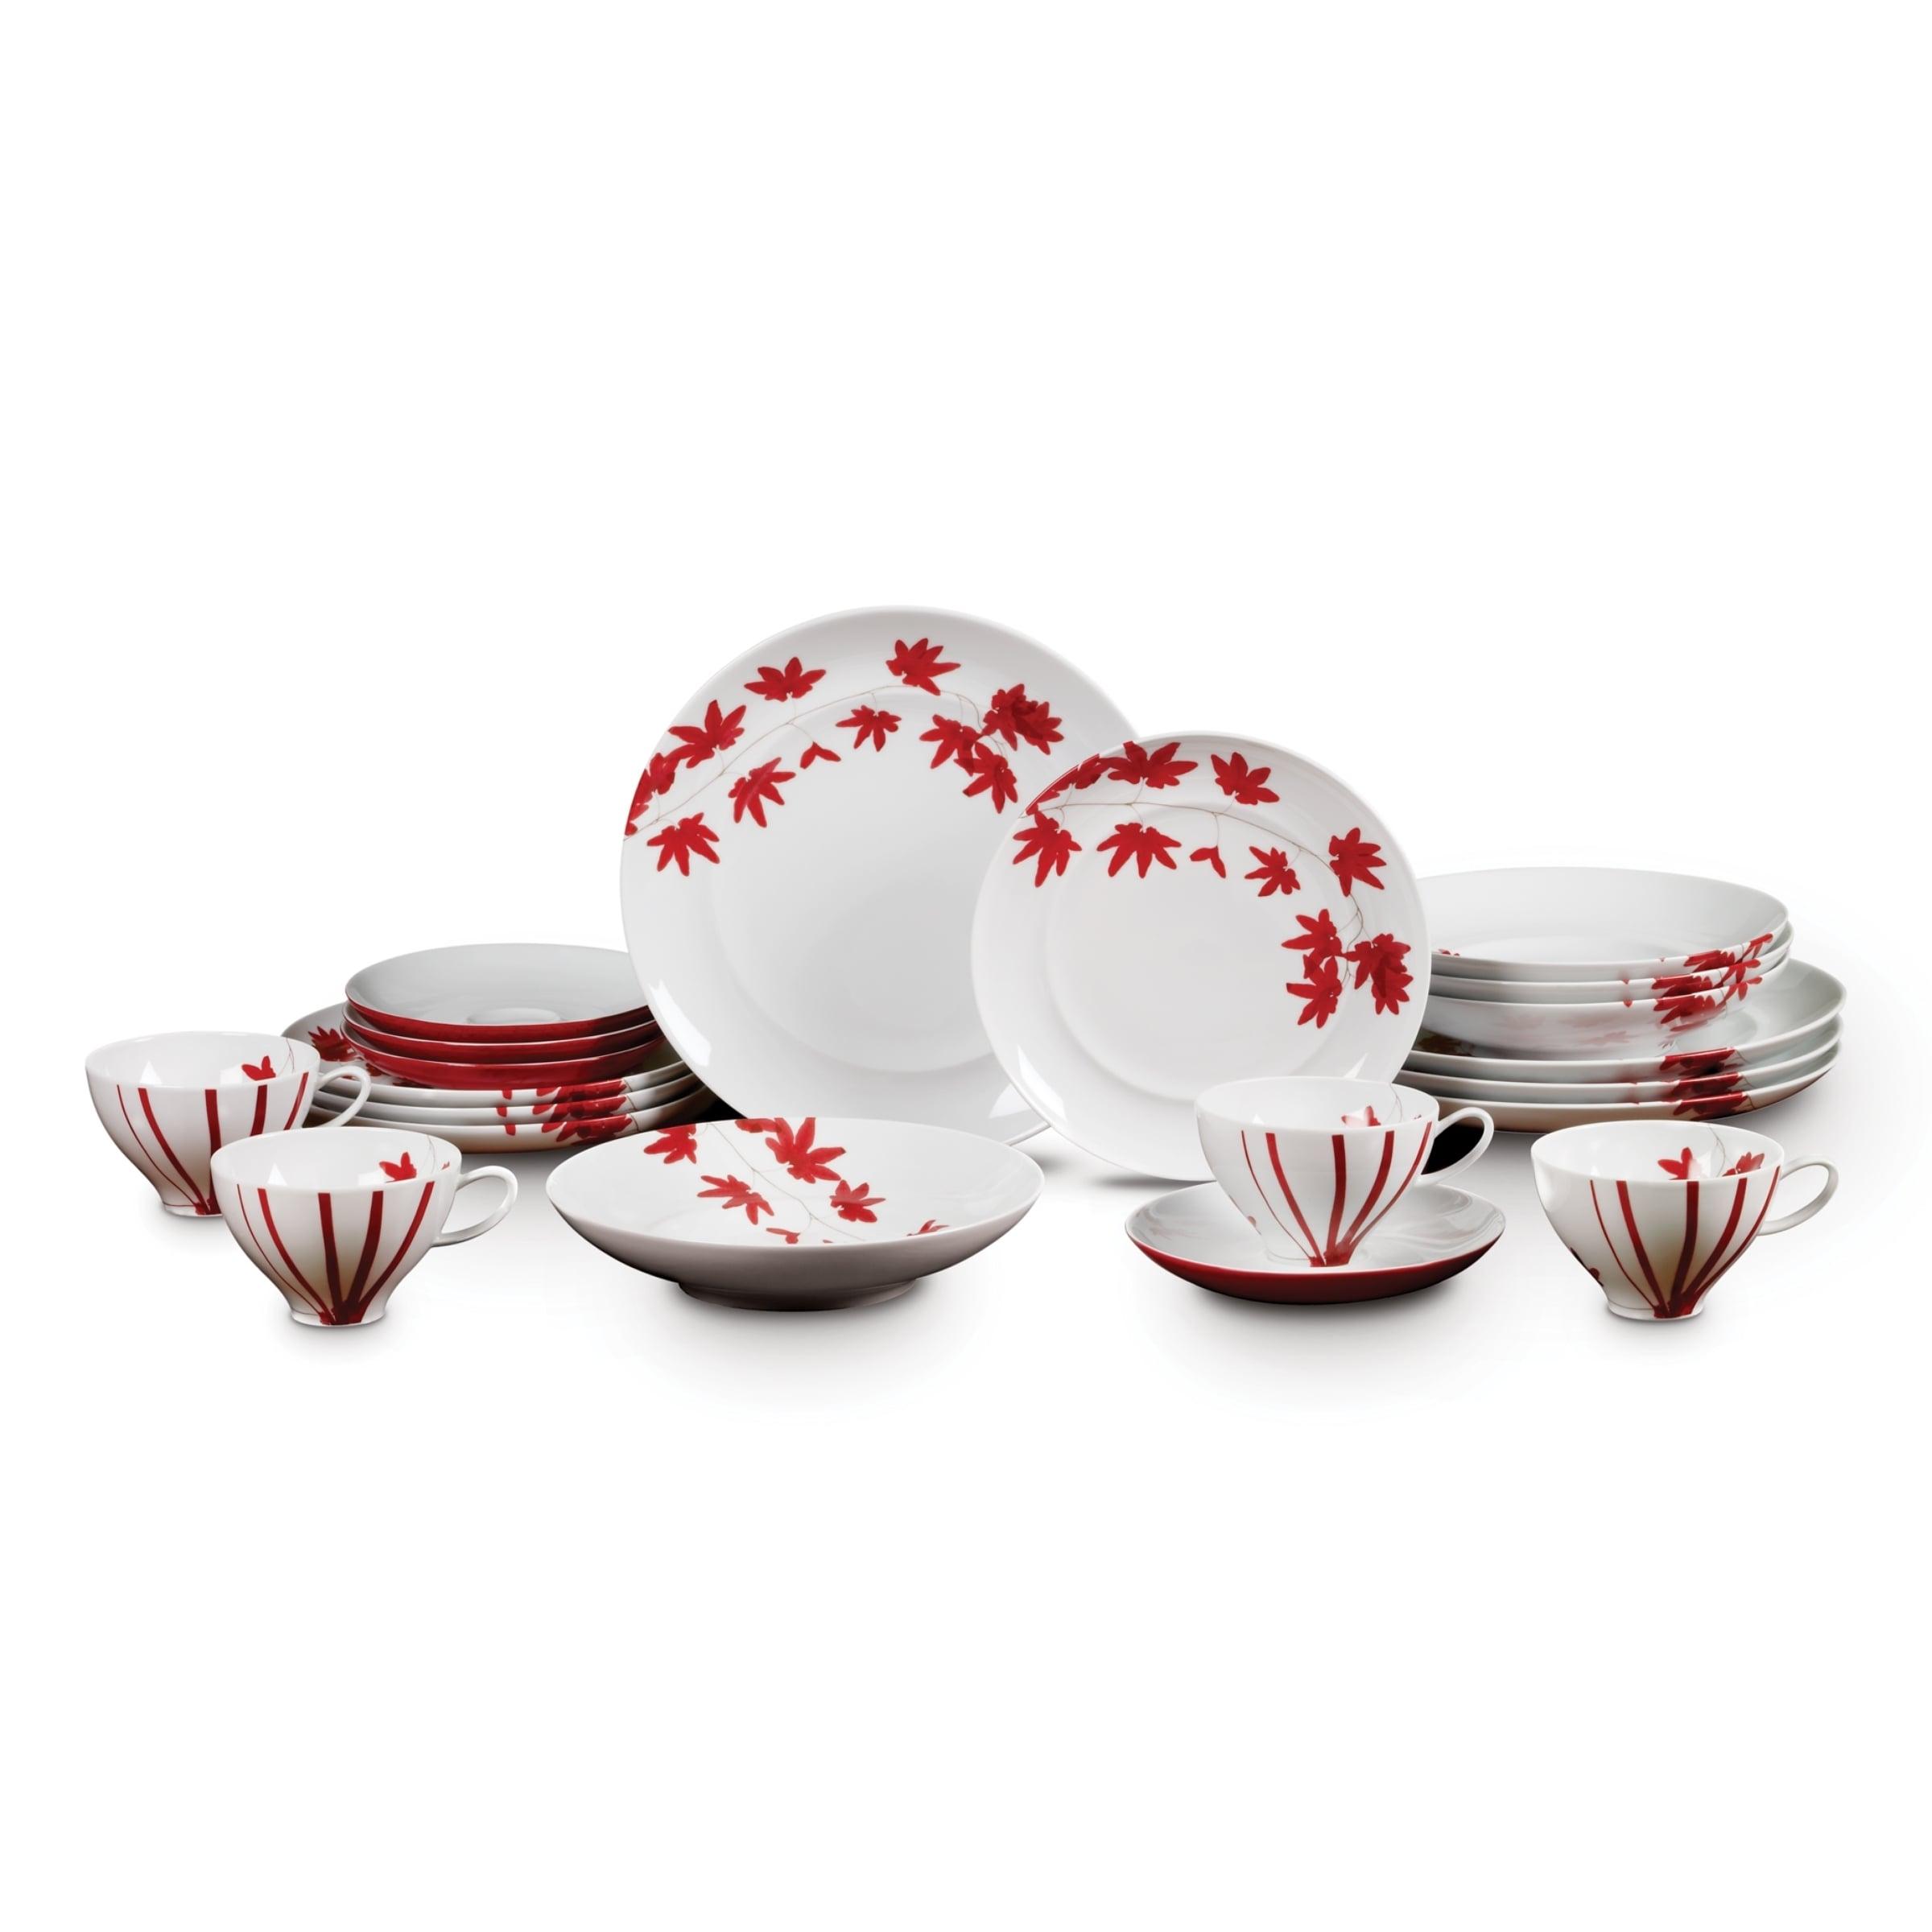 Mikasa Red Porcelain Dinnerware Set Overstock 12897871